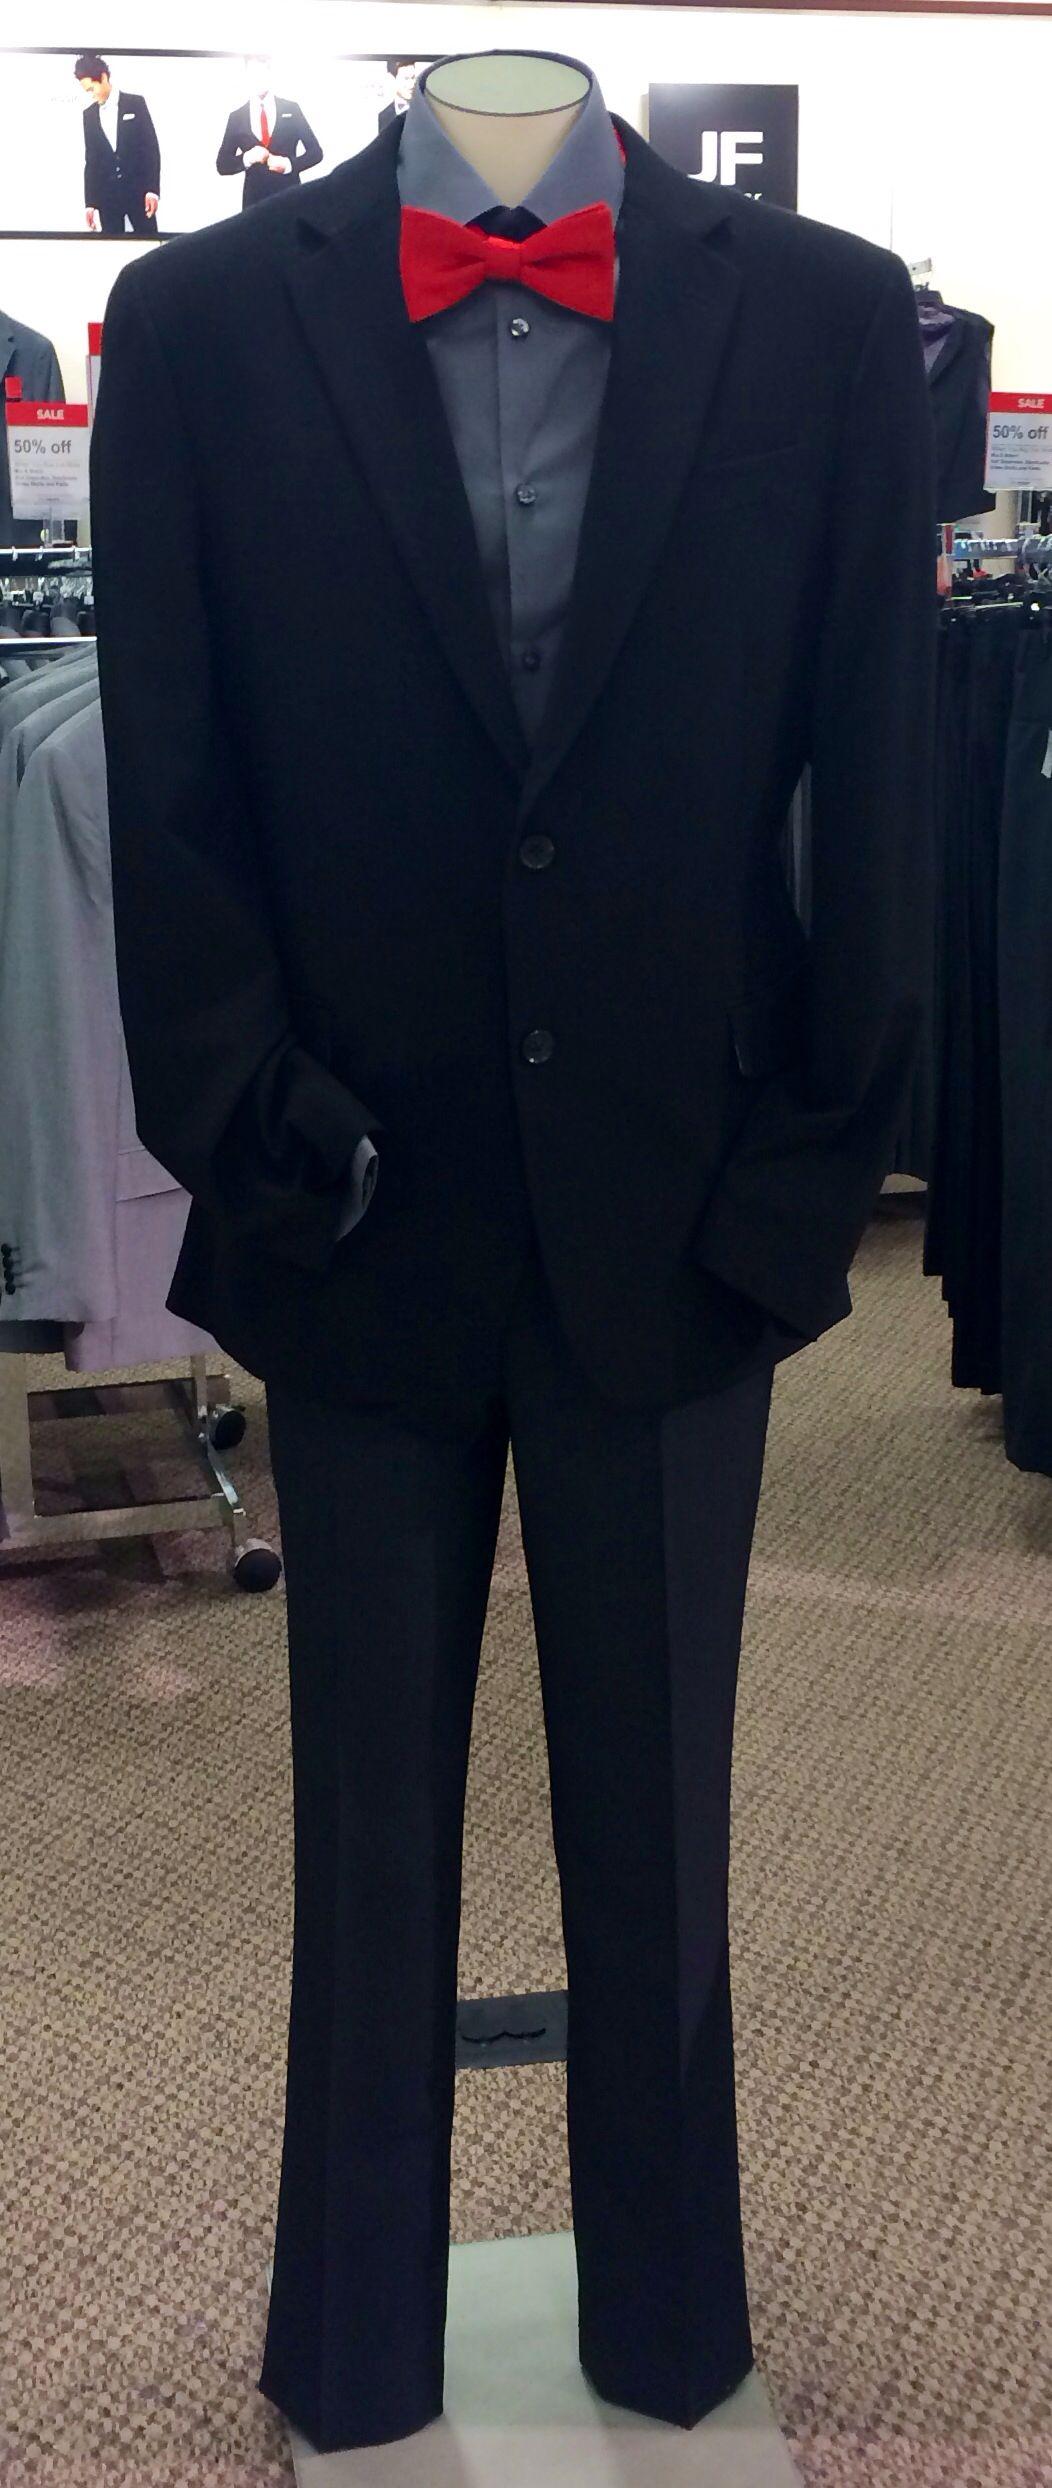 Black jacket grey shirt red tie